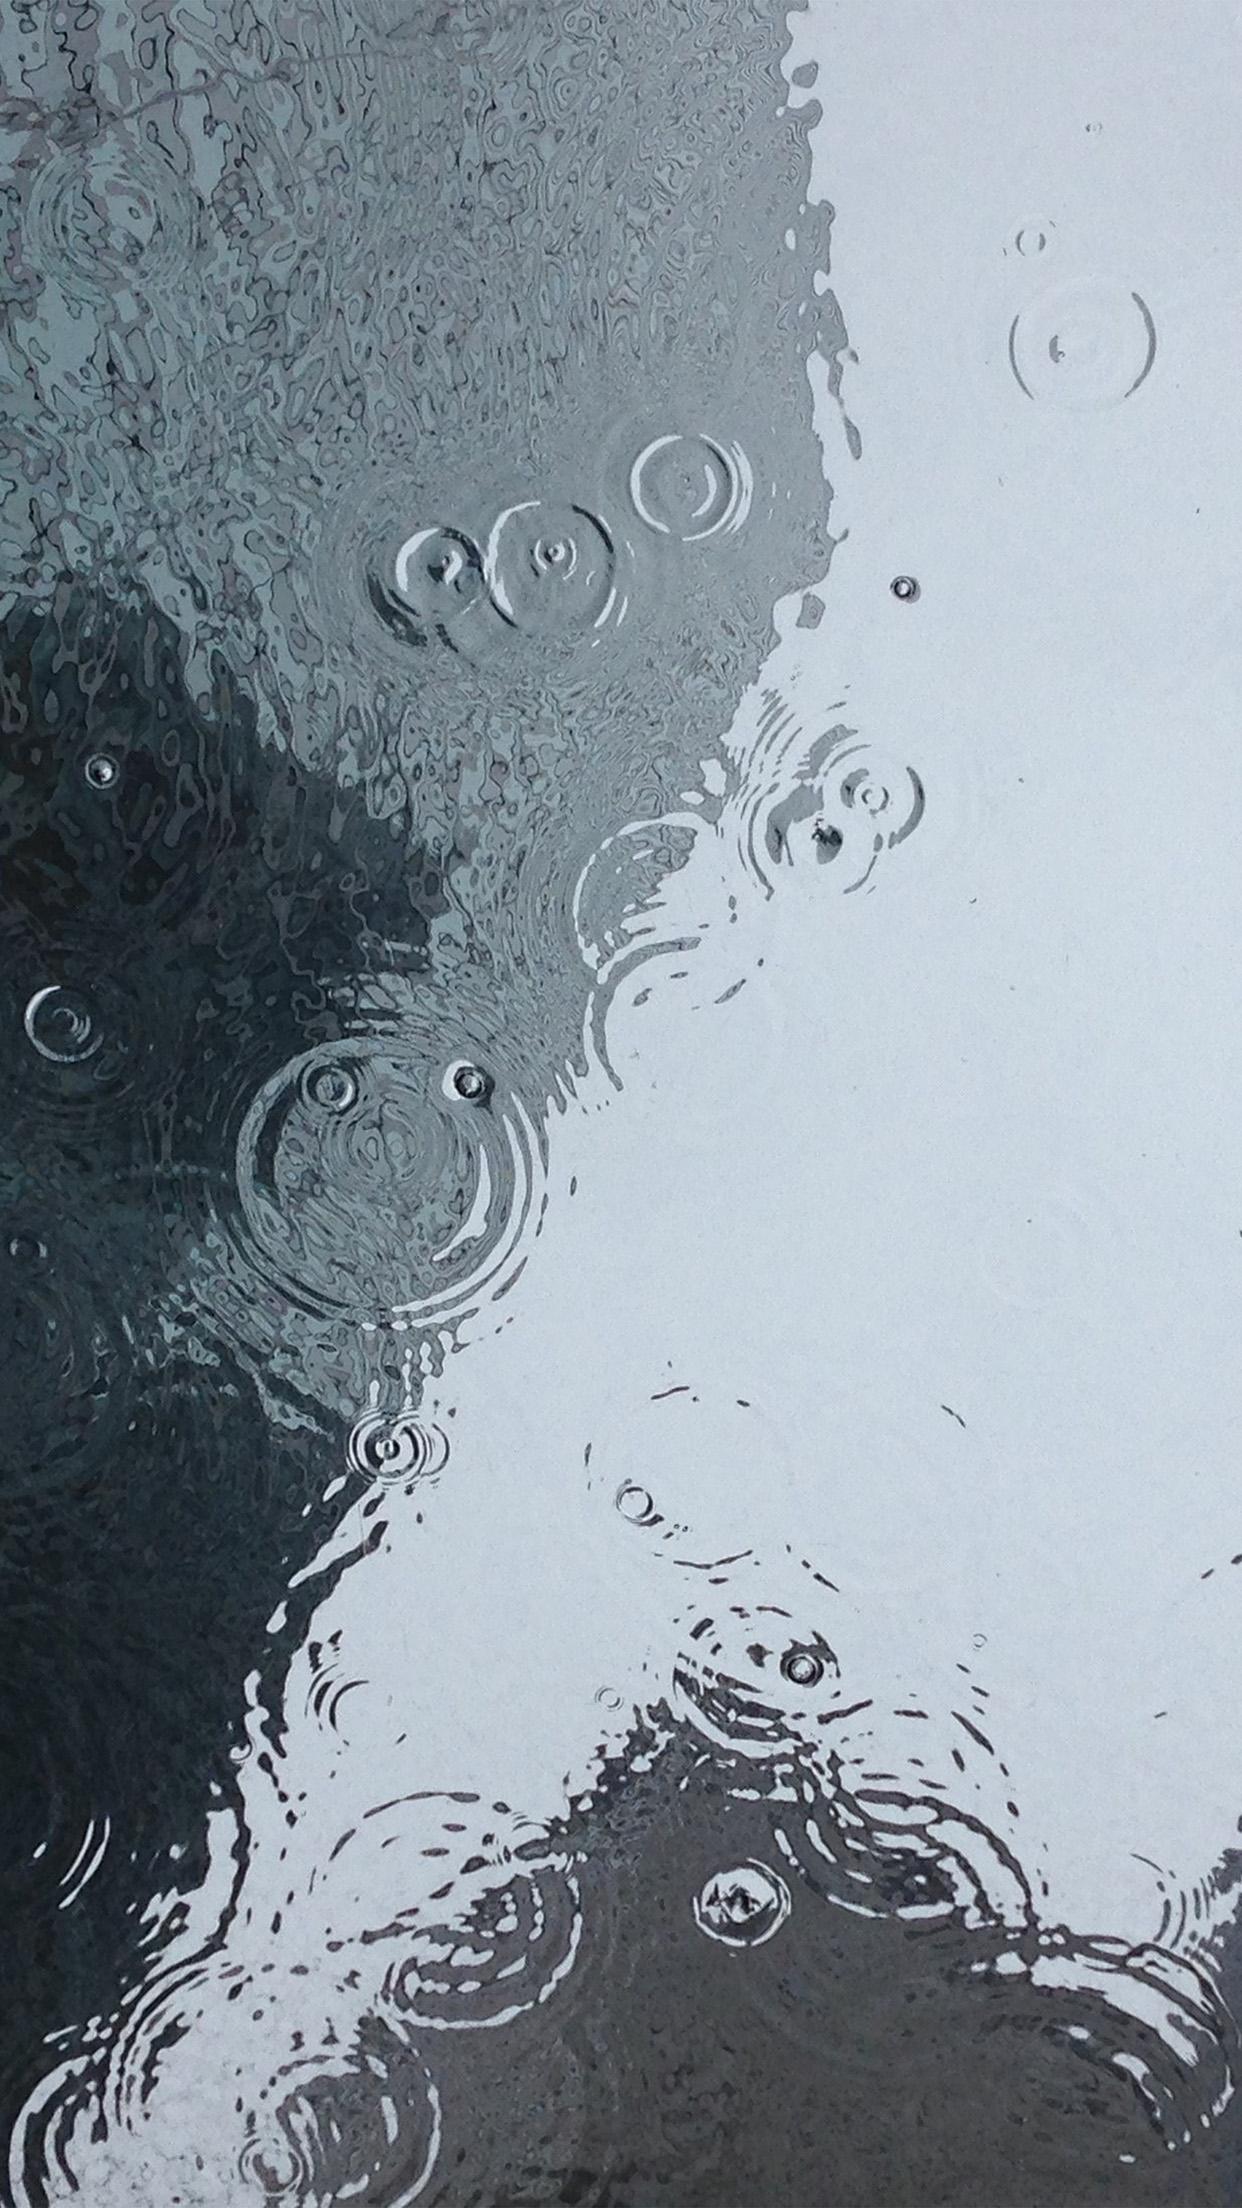 Iphone6paperscom Iphone 6 Wallpaper Ni03 Raindrop Day City